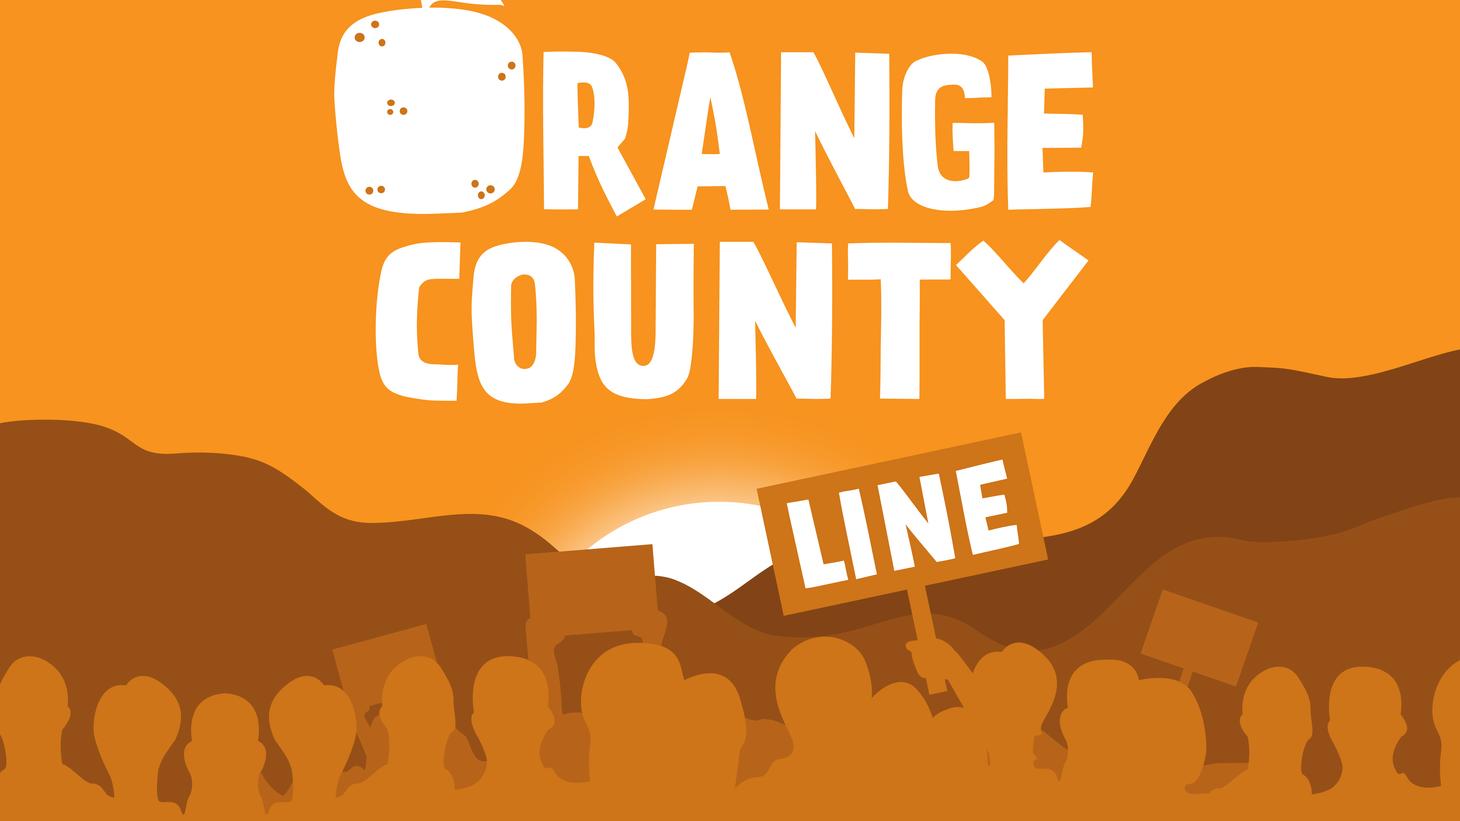 A federal investigation declares that Orange County's jails system have improved.